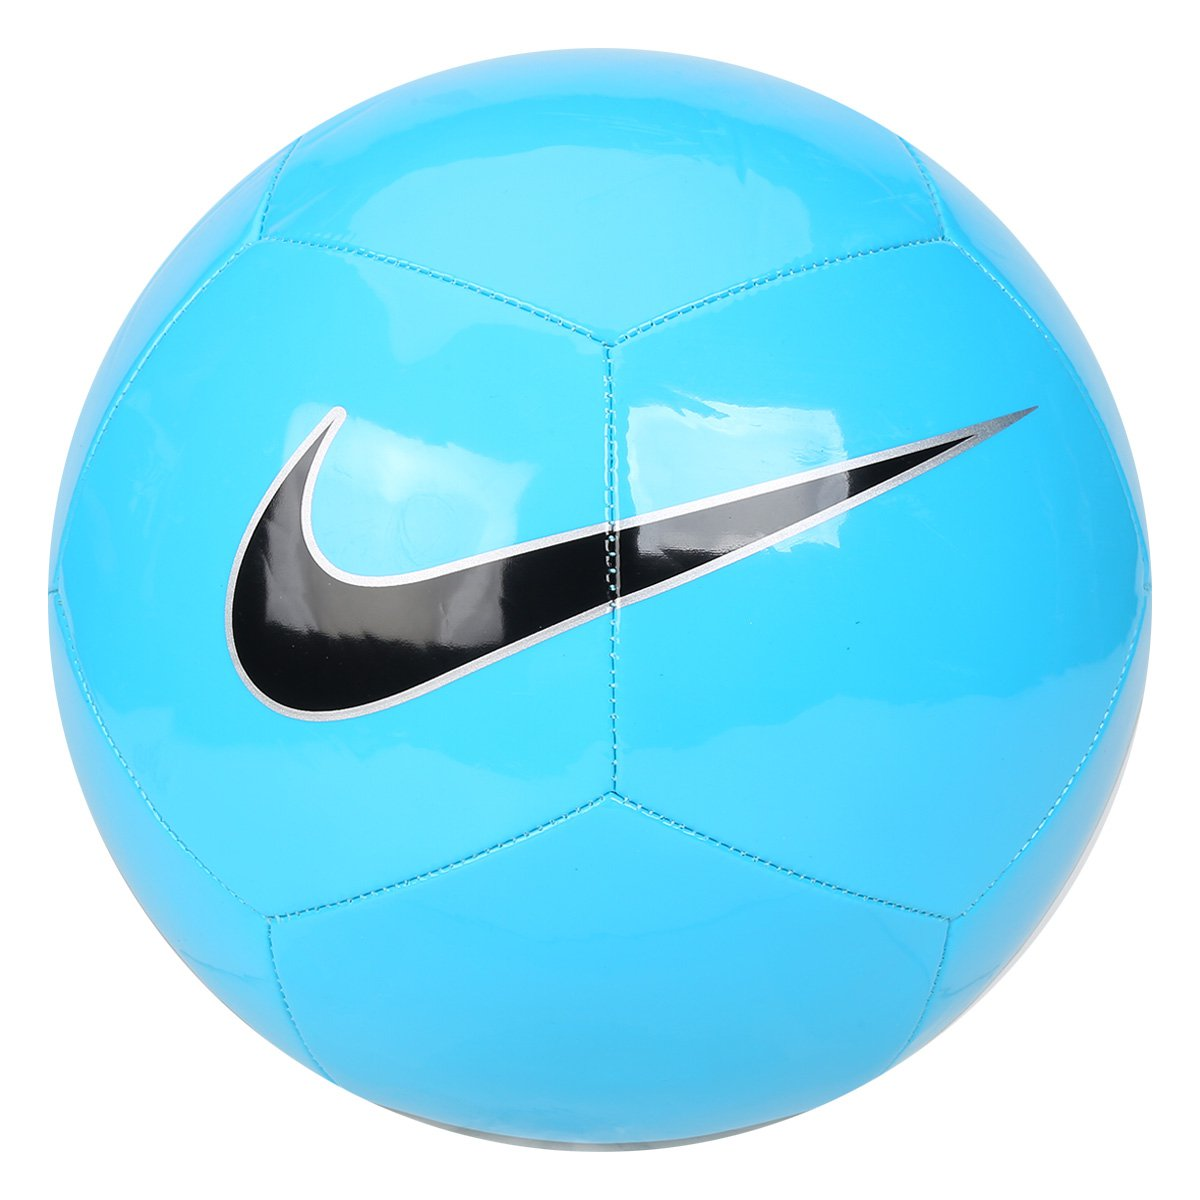 Bola Futebol Campo Nike Pitch Trainning ed800059f5700